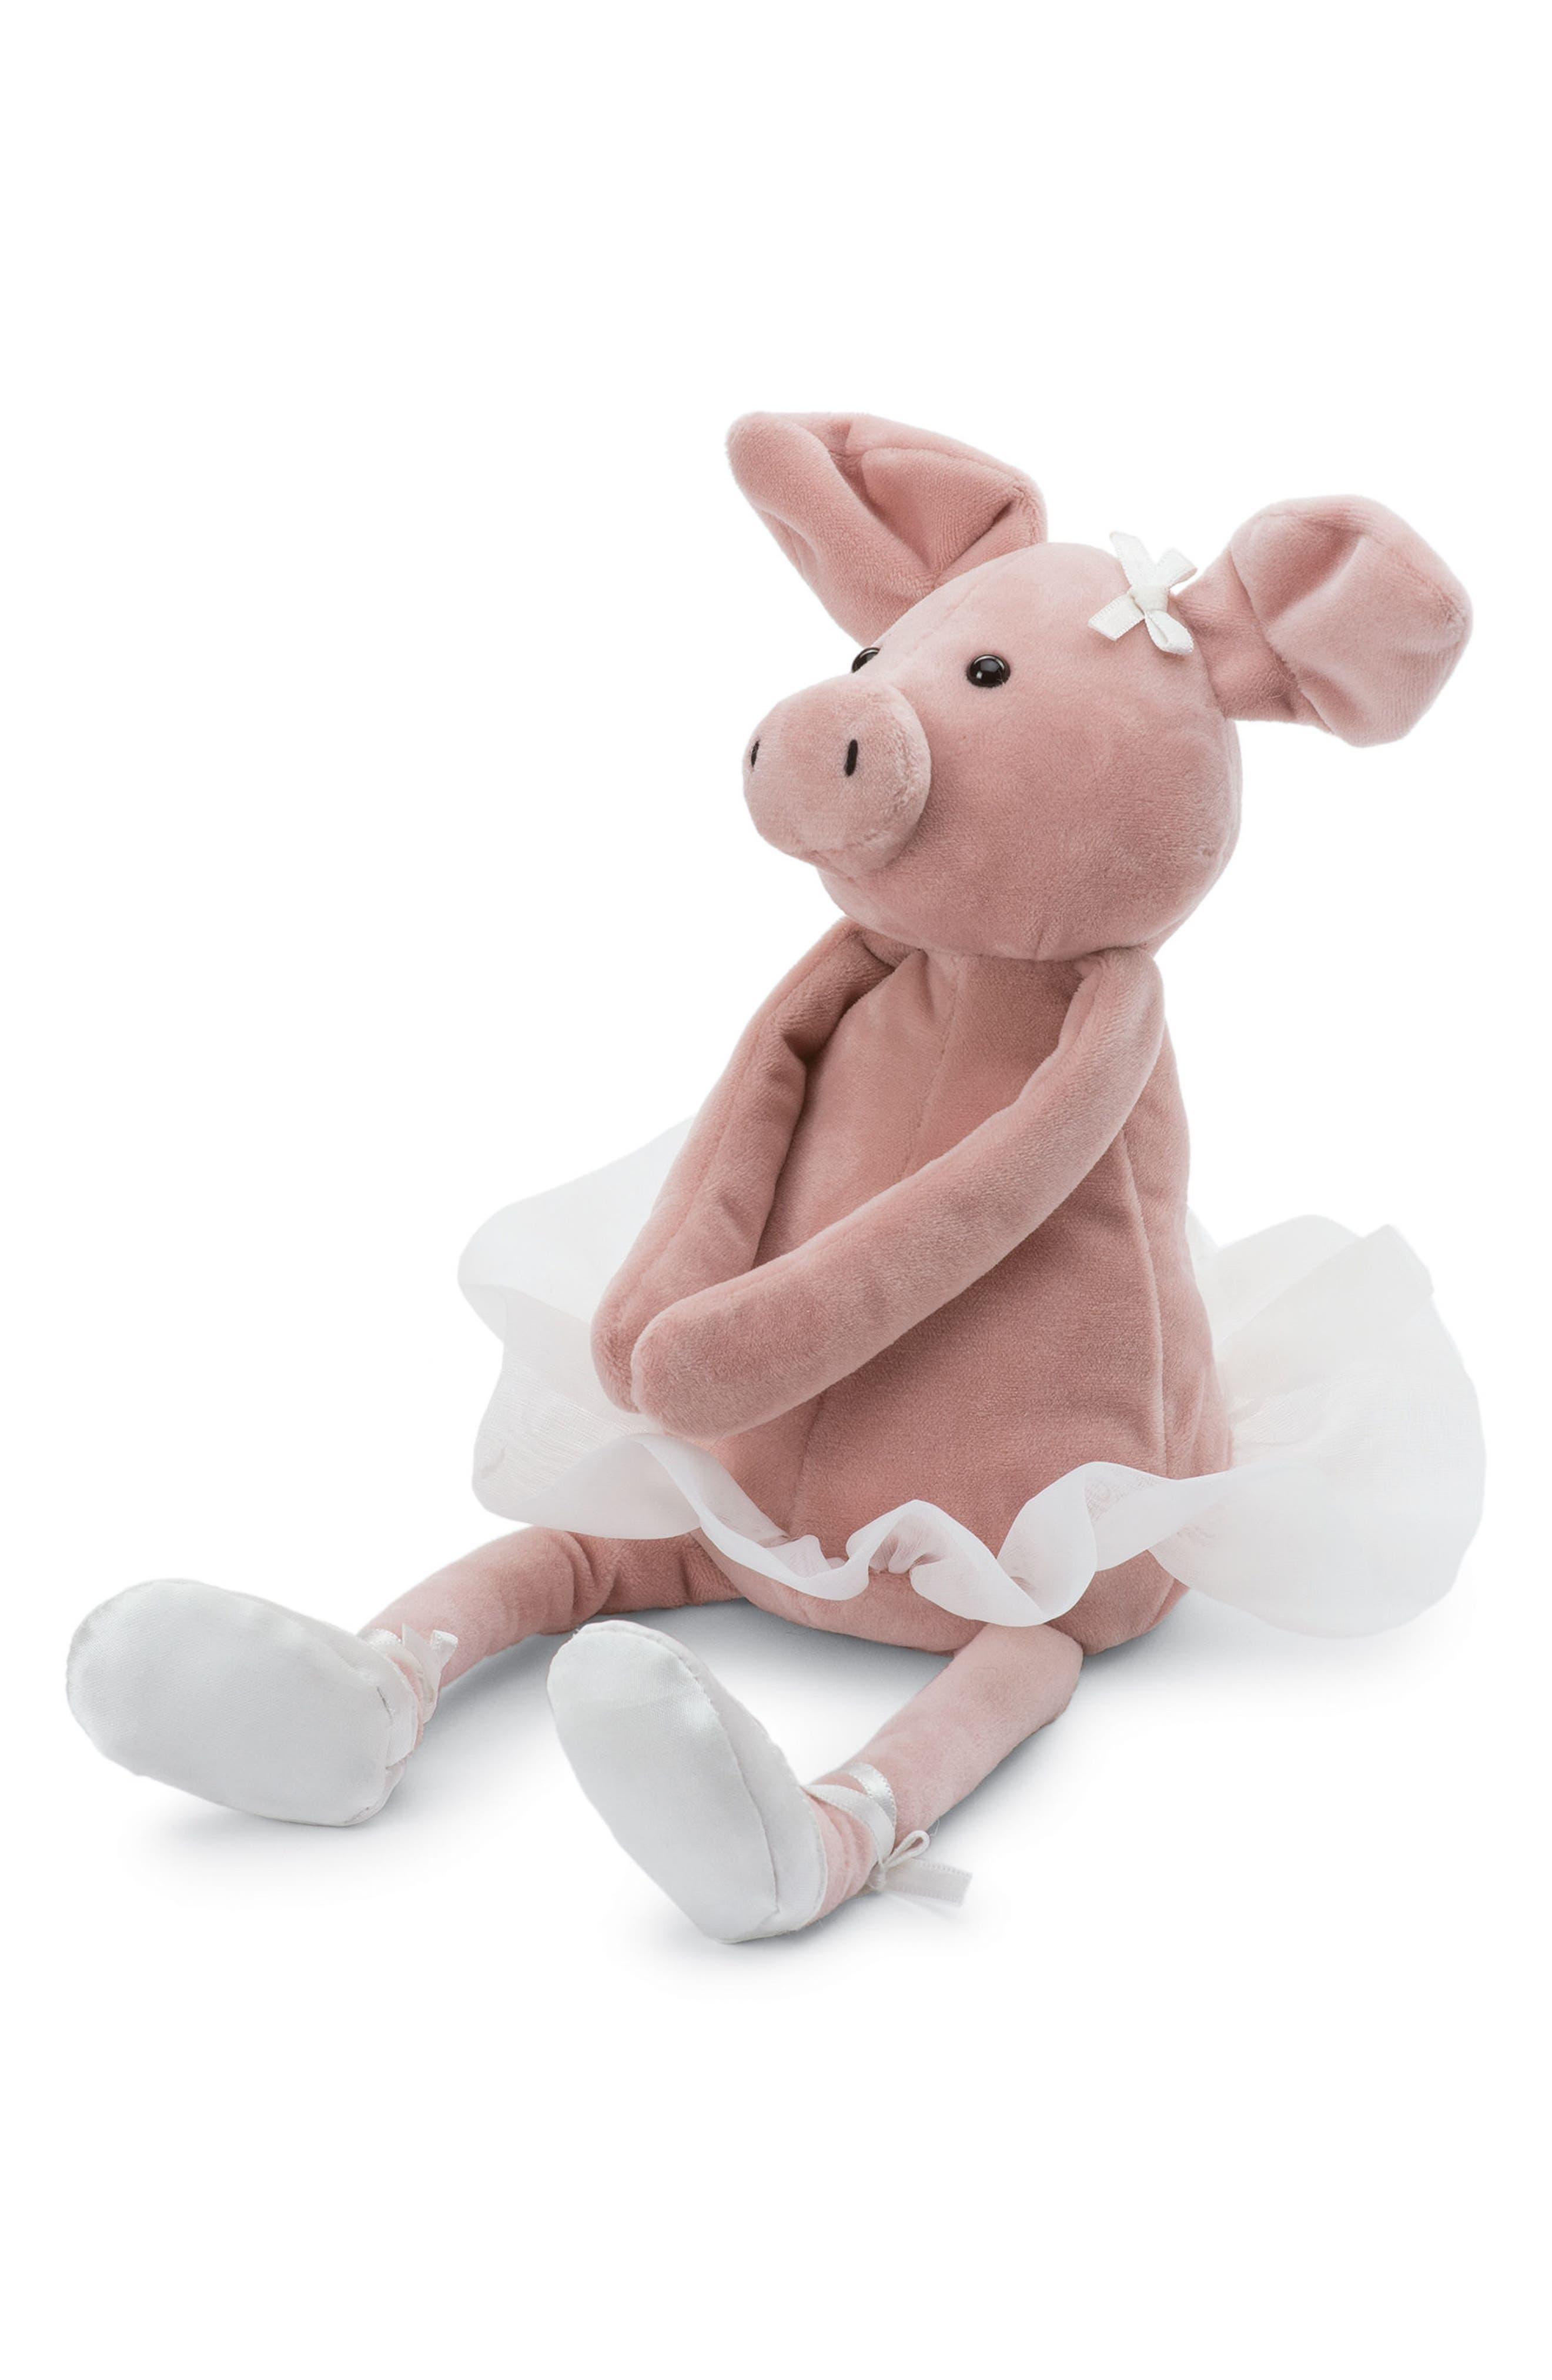 Dancing Darcey Piglet Stuffed Animal,                         Main,                         color, Pink